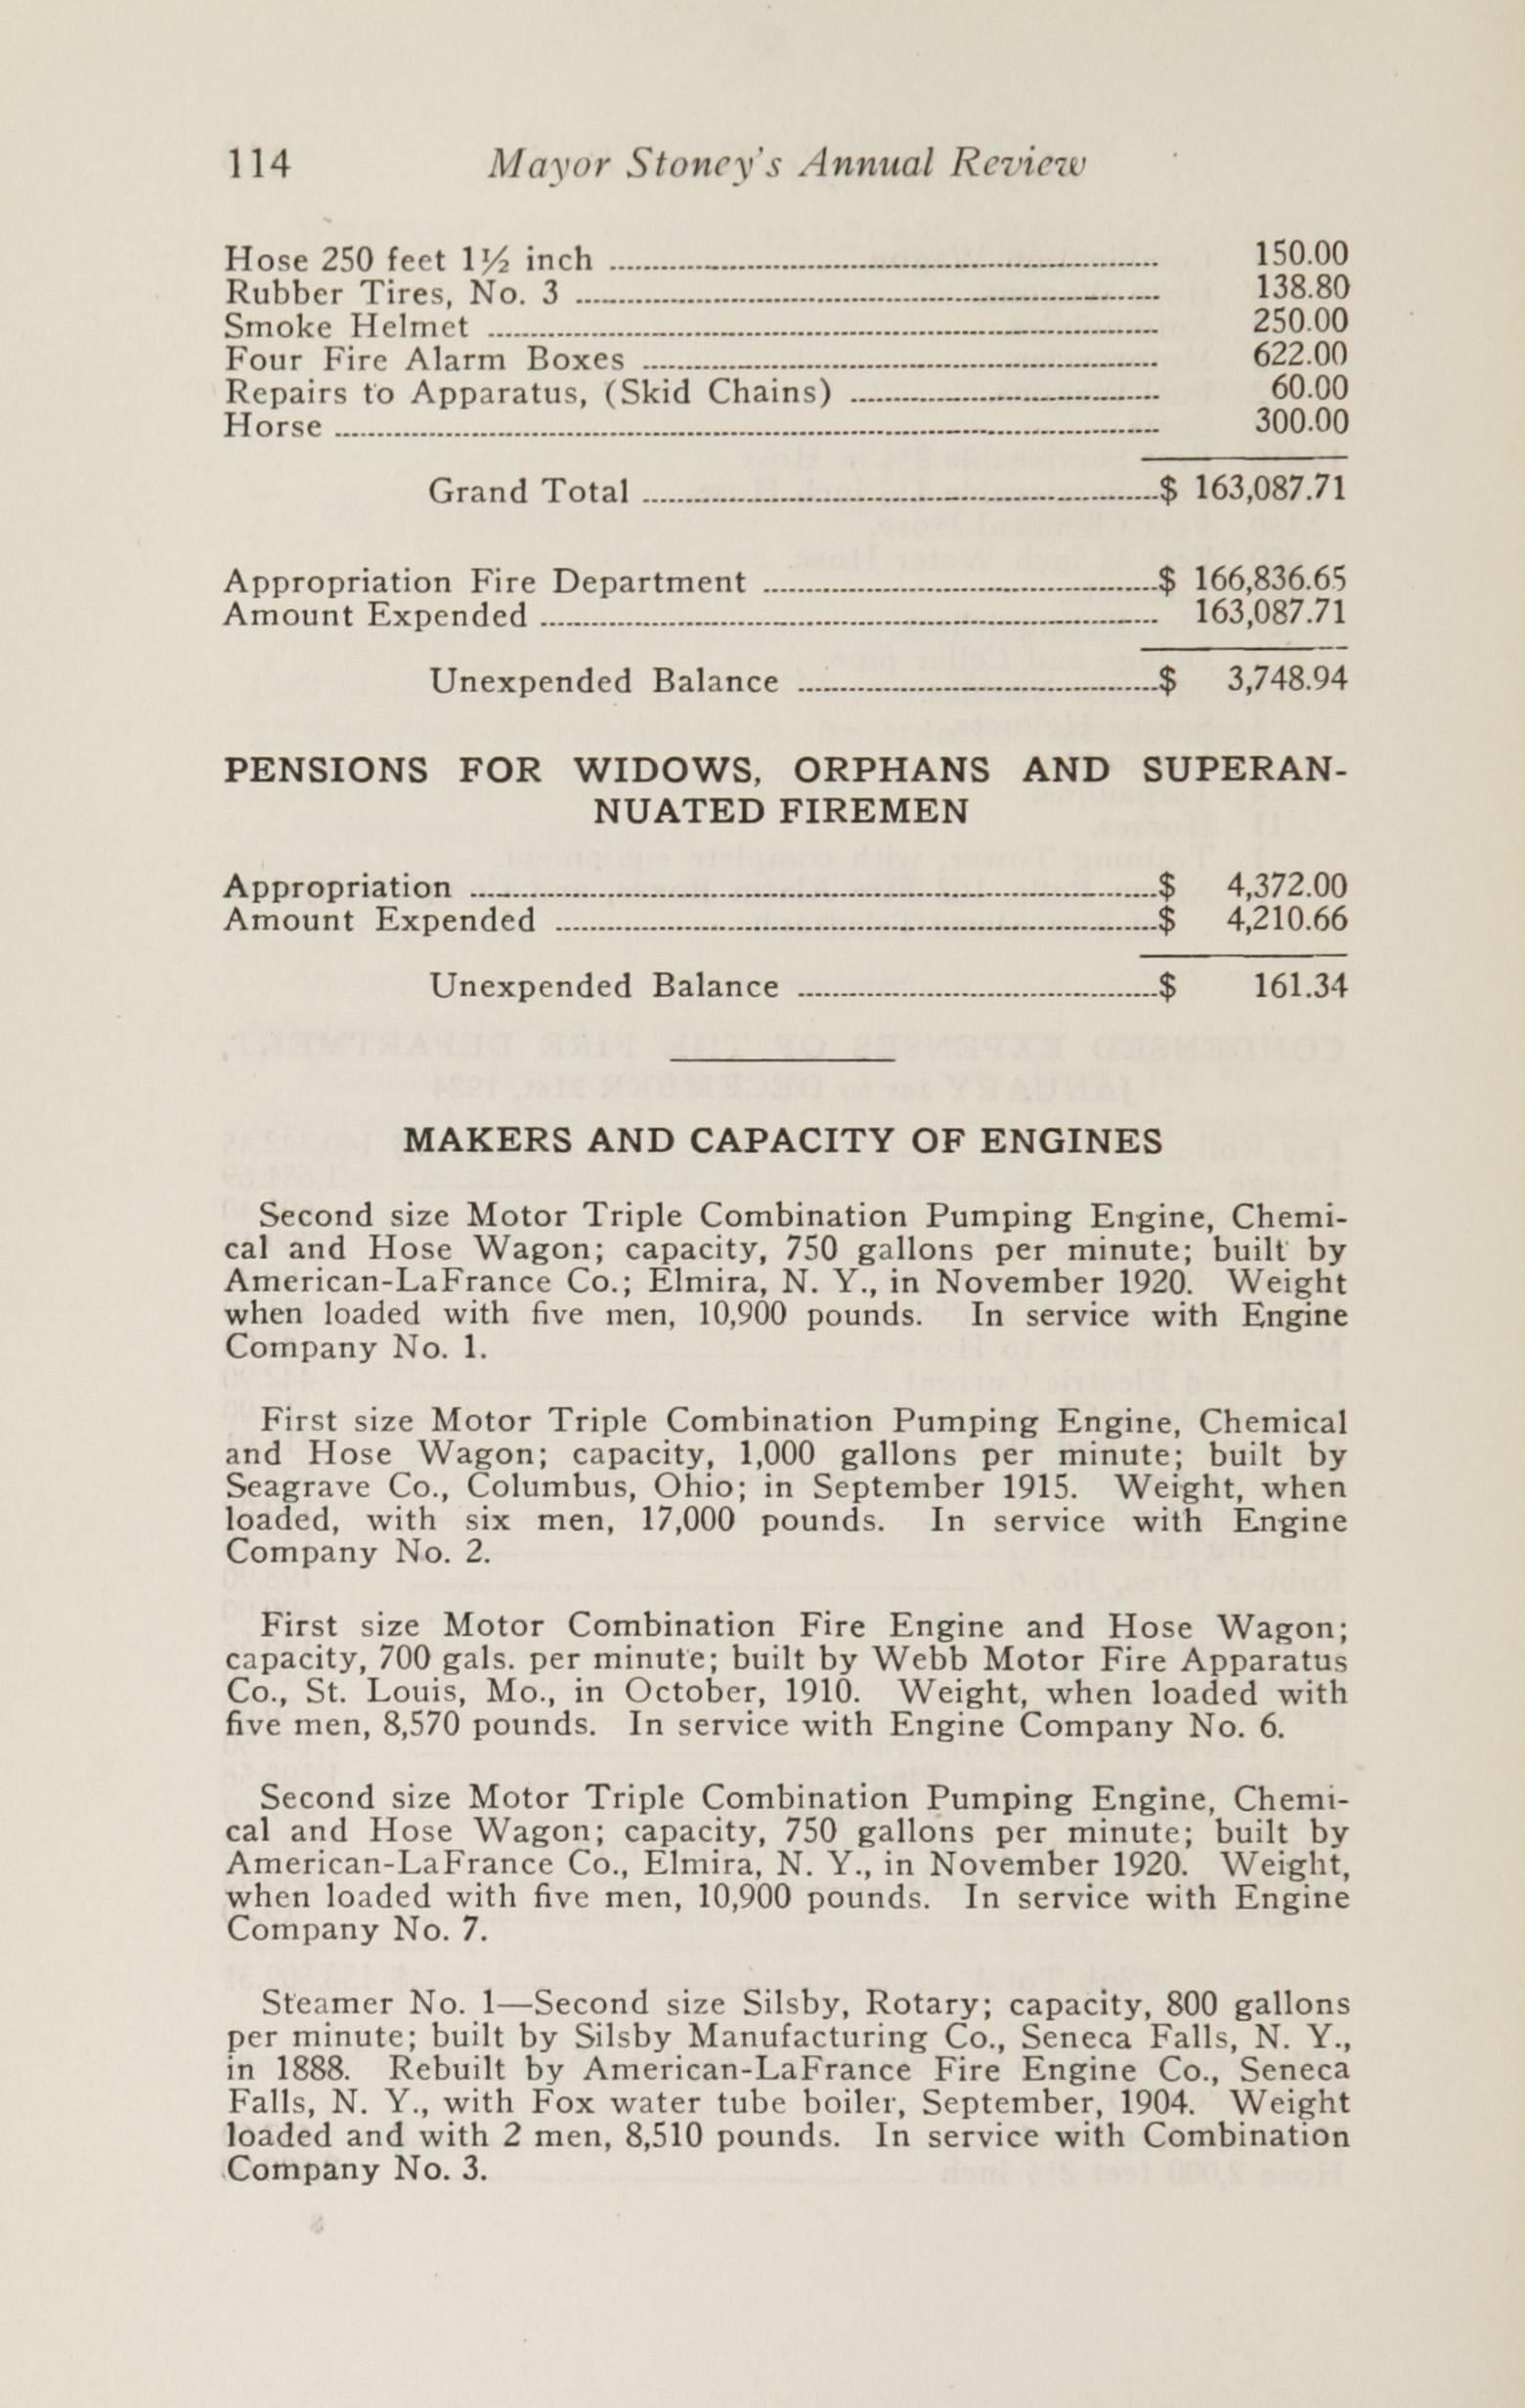 Charleston Yearbook, 1924, page 114